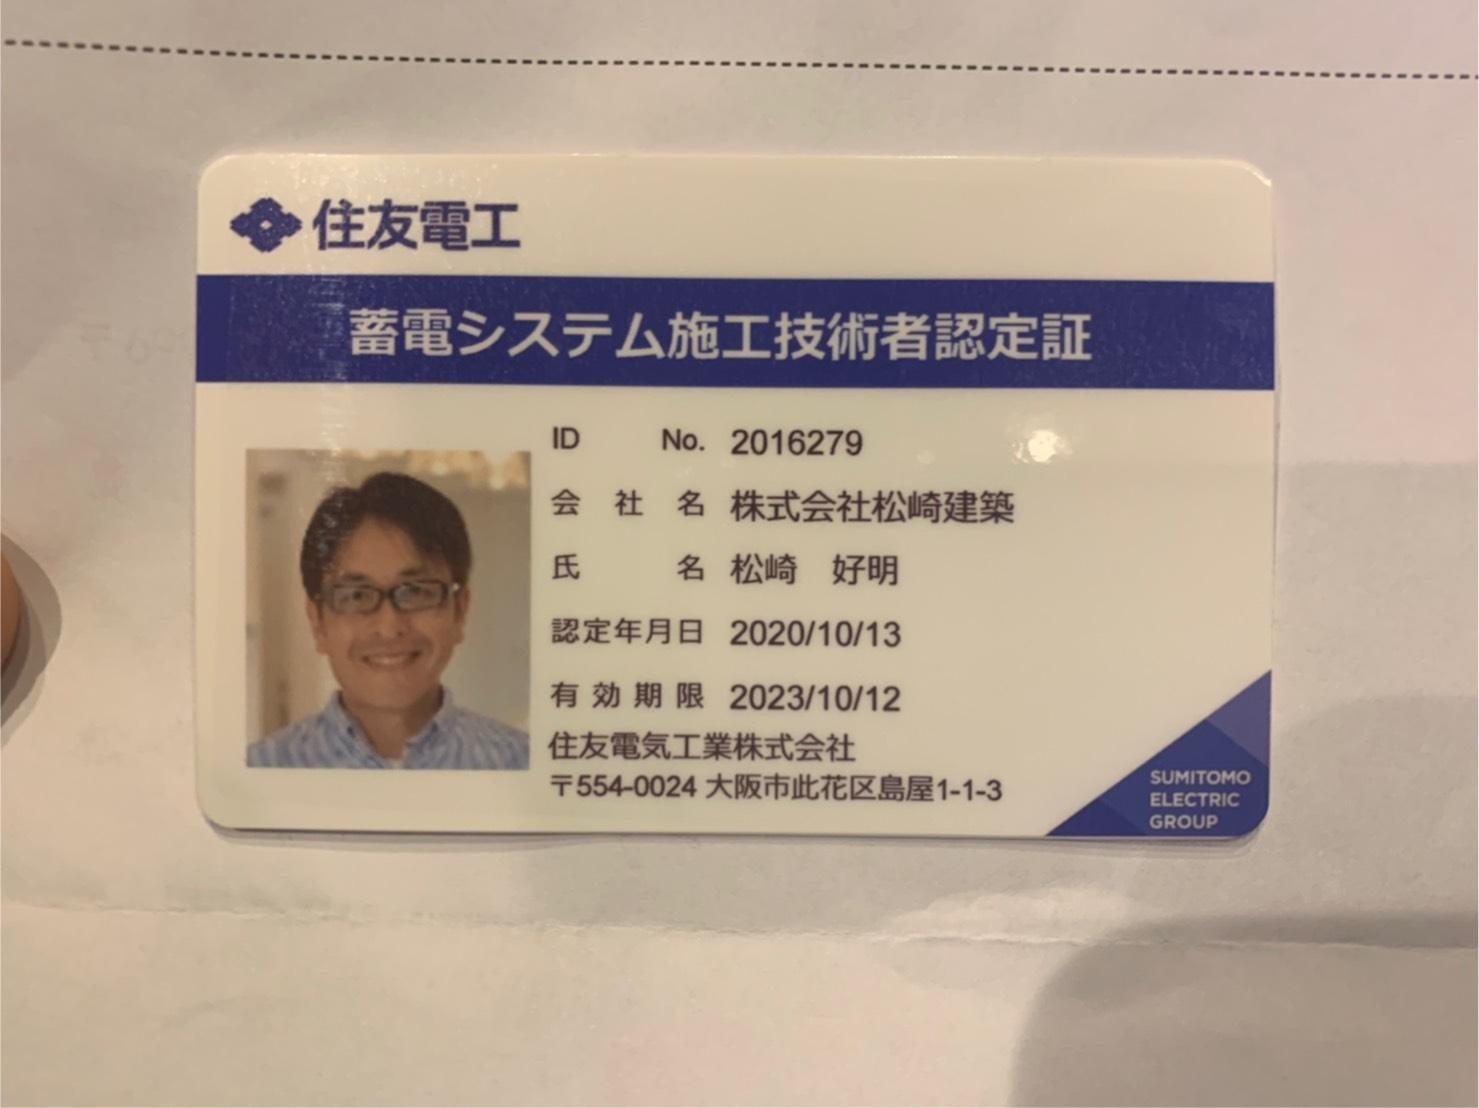 https://www.matsuzaki-k.jp/diaryblog/image0%20%2843%29.jpeg